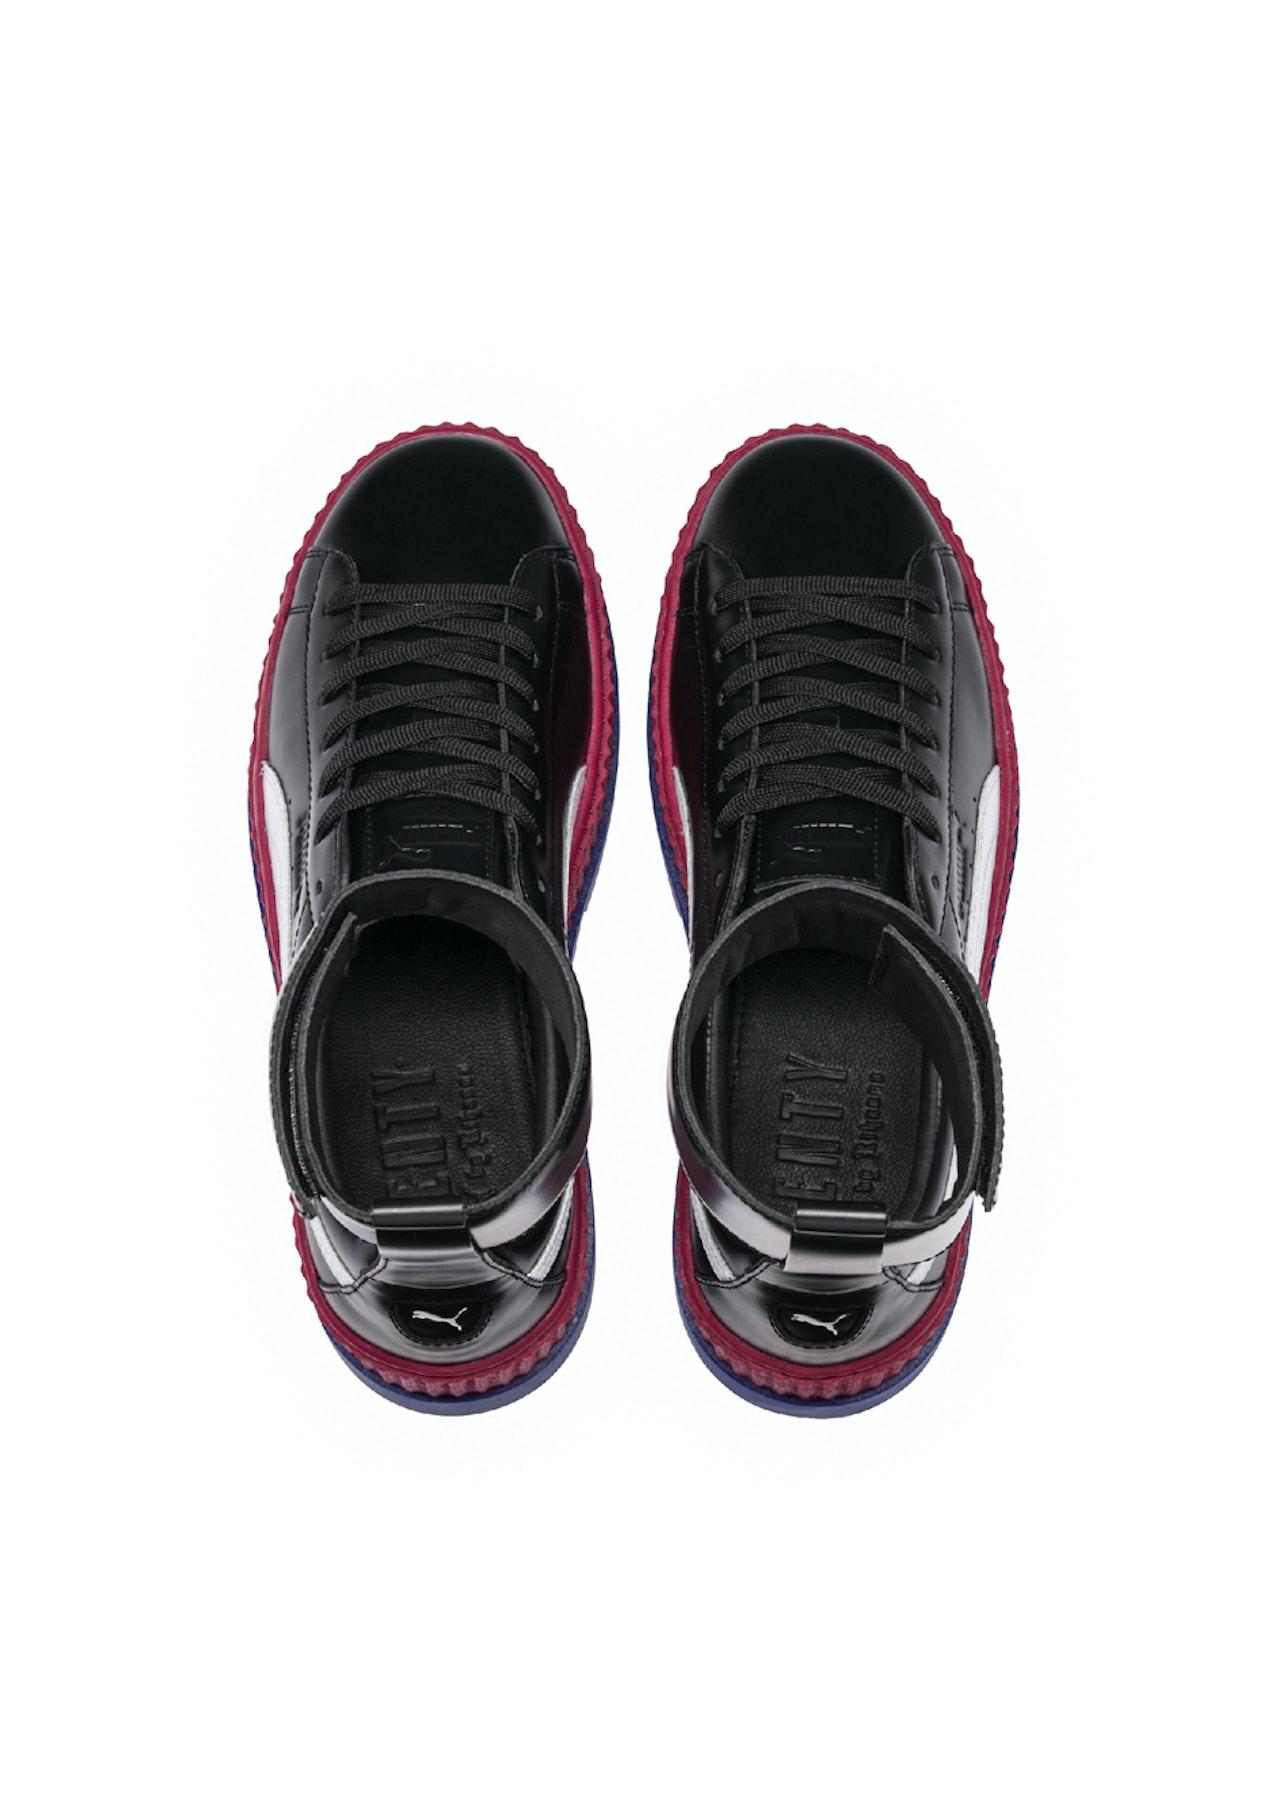 reputable site 8d432 81e2d FENTY Womens Ankle Strap Sneaker